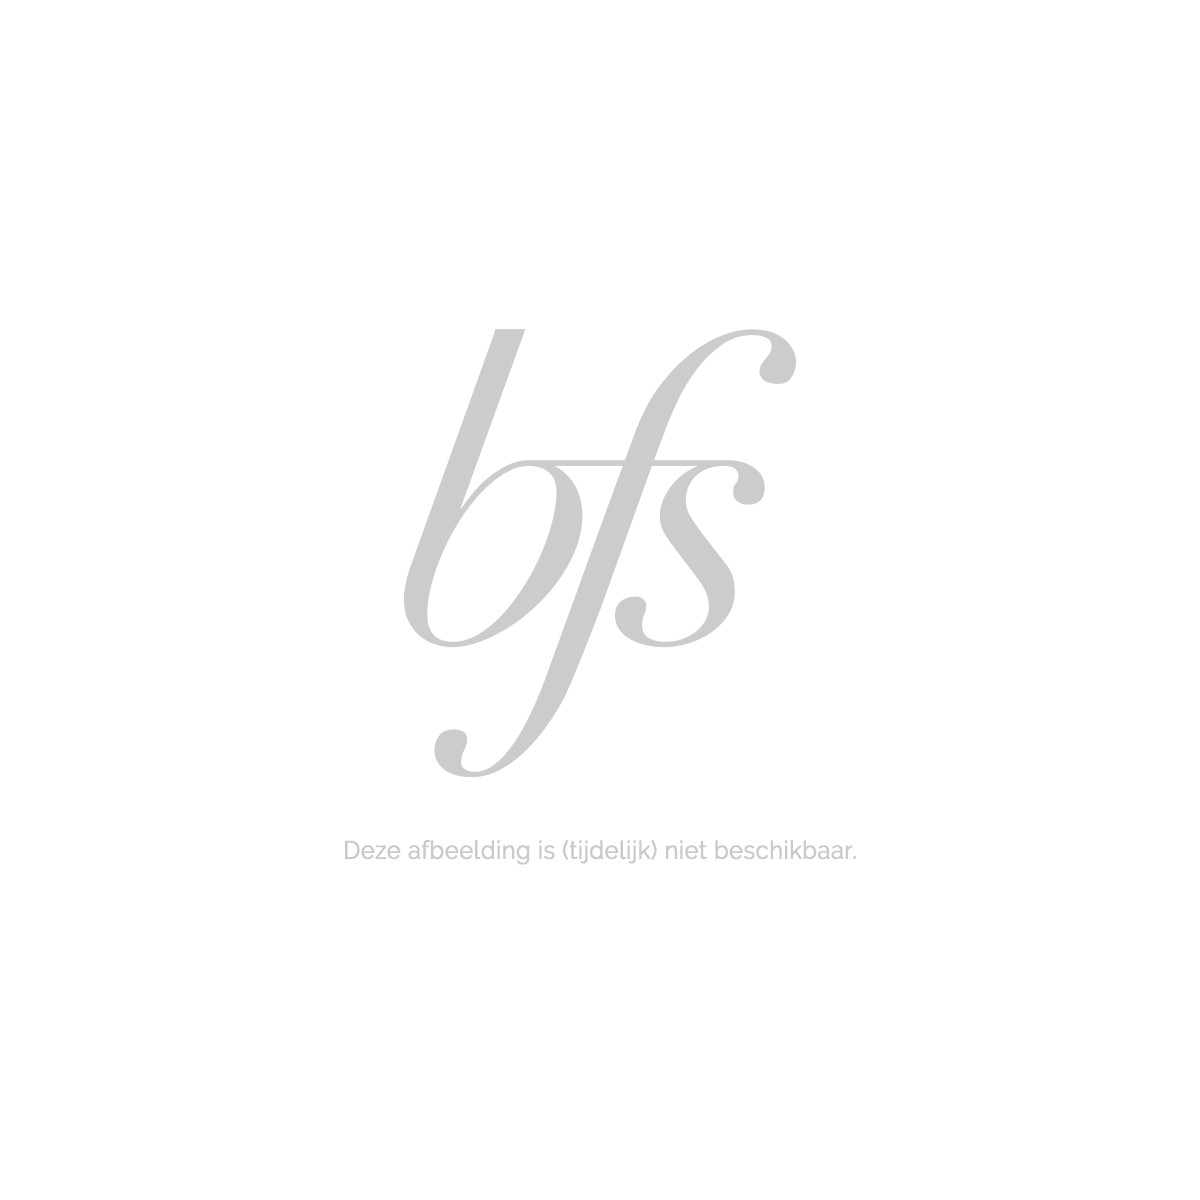 Elie Saab Le Parfum In White Eau De Parfum Spray 50 Ml